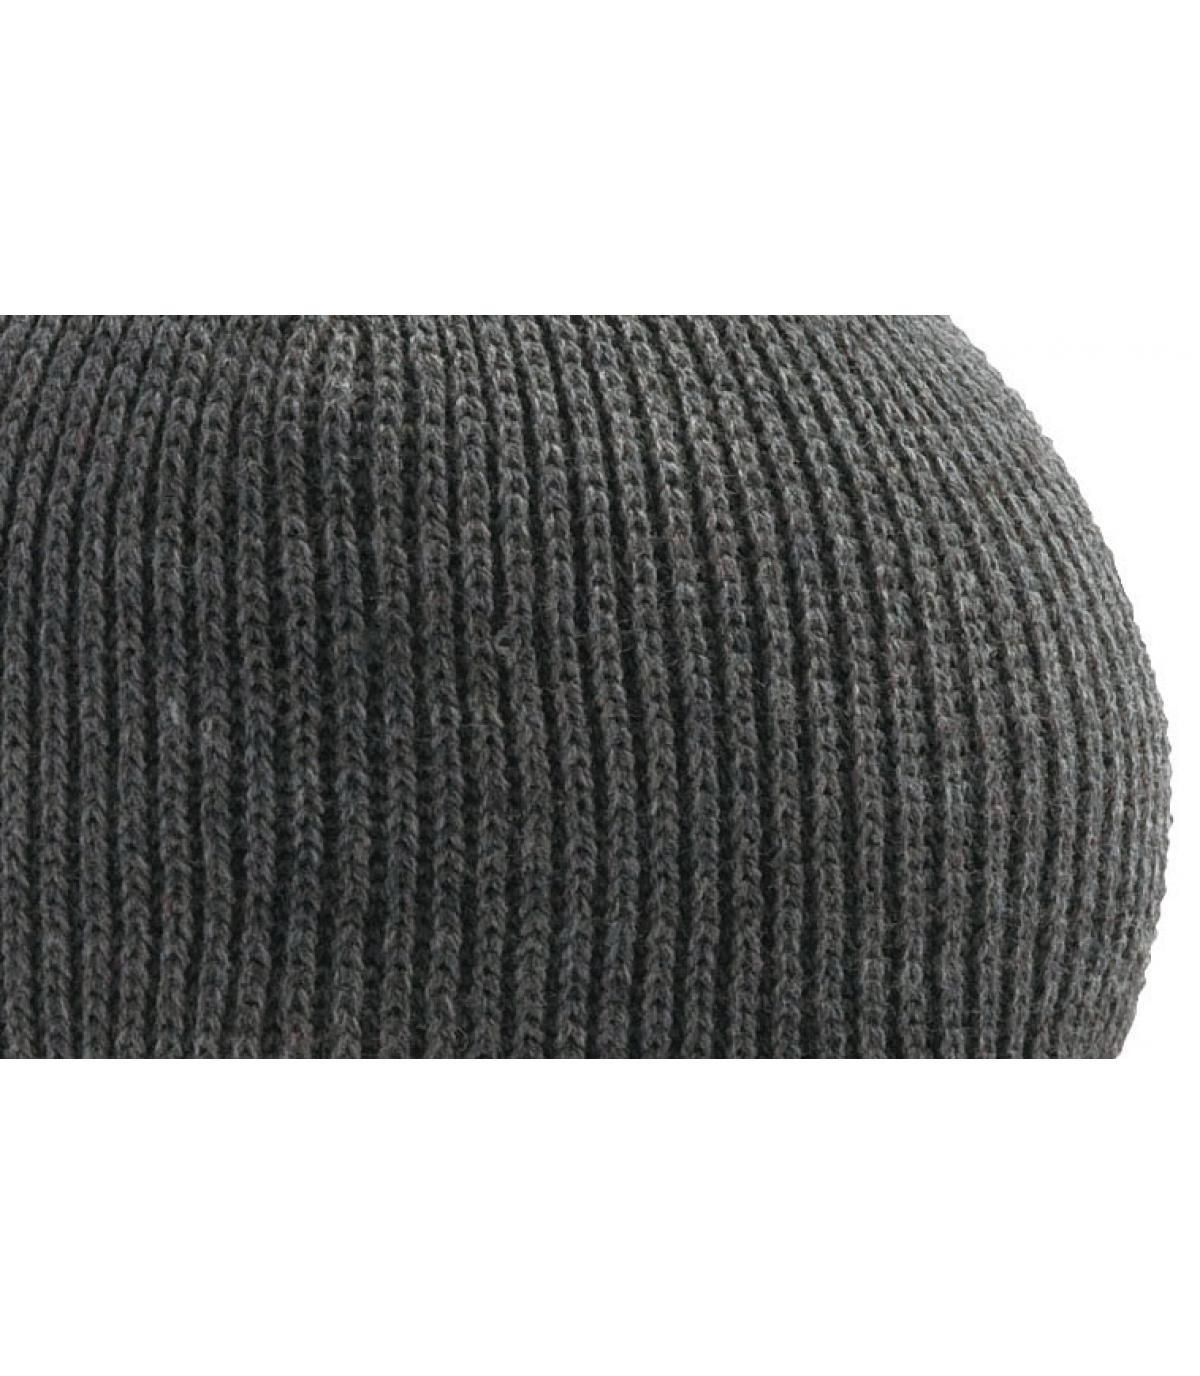 Bonnet The basic charcoal